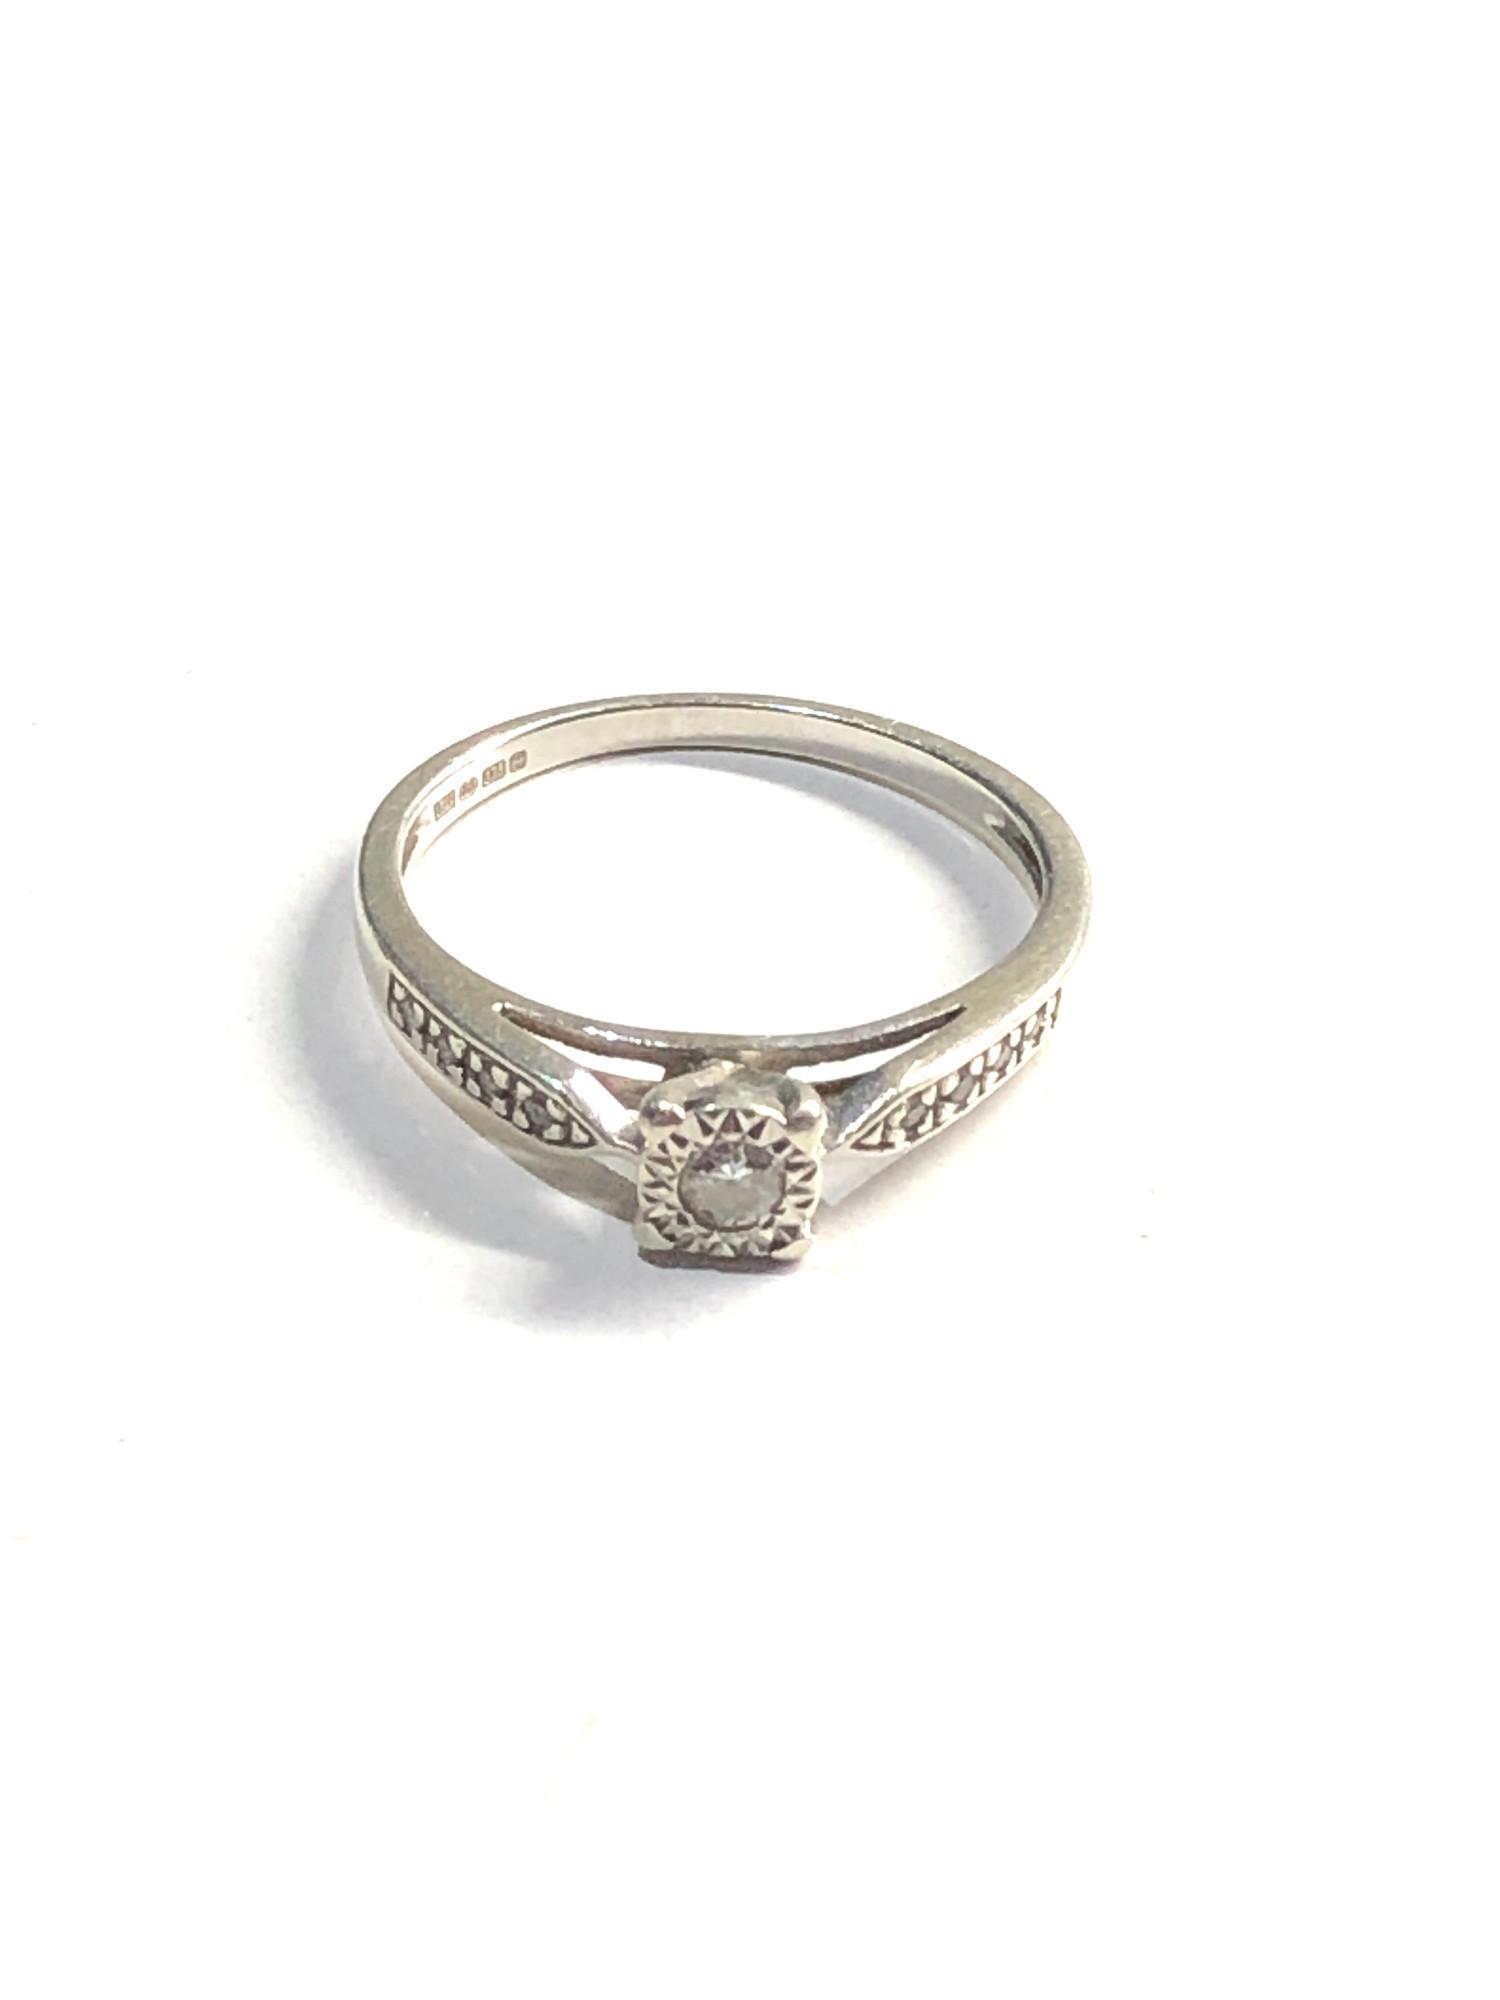 9ct White gold diamond ring 1.8g